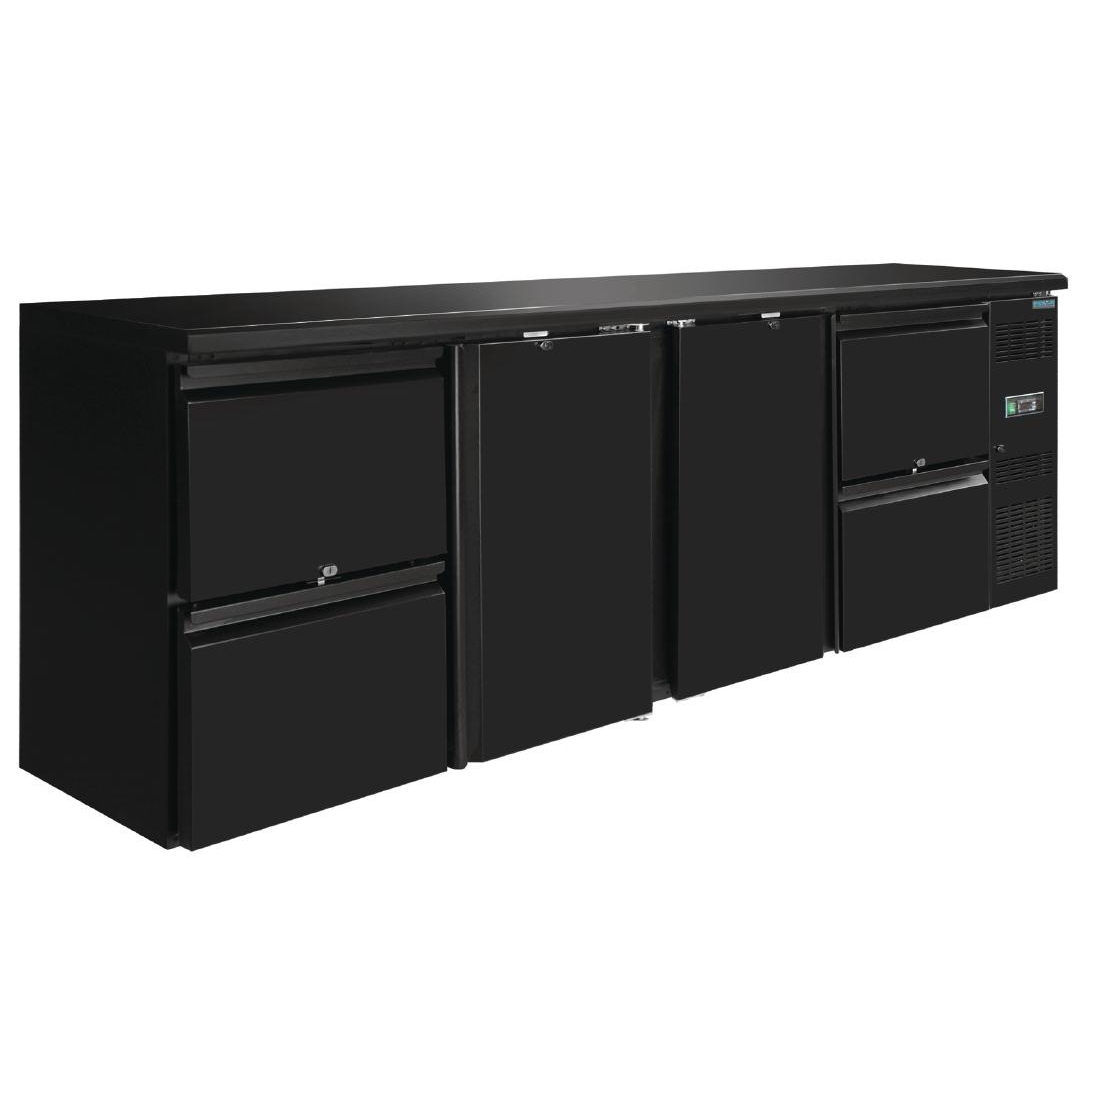 Arrière-bar Polar Série U 2 portes et 4 tiroirs